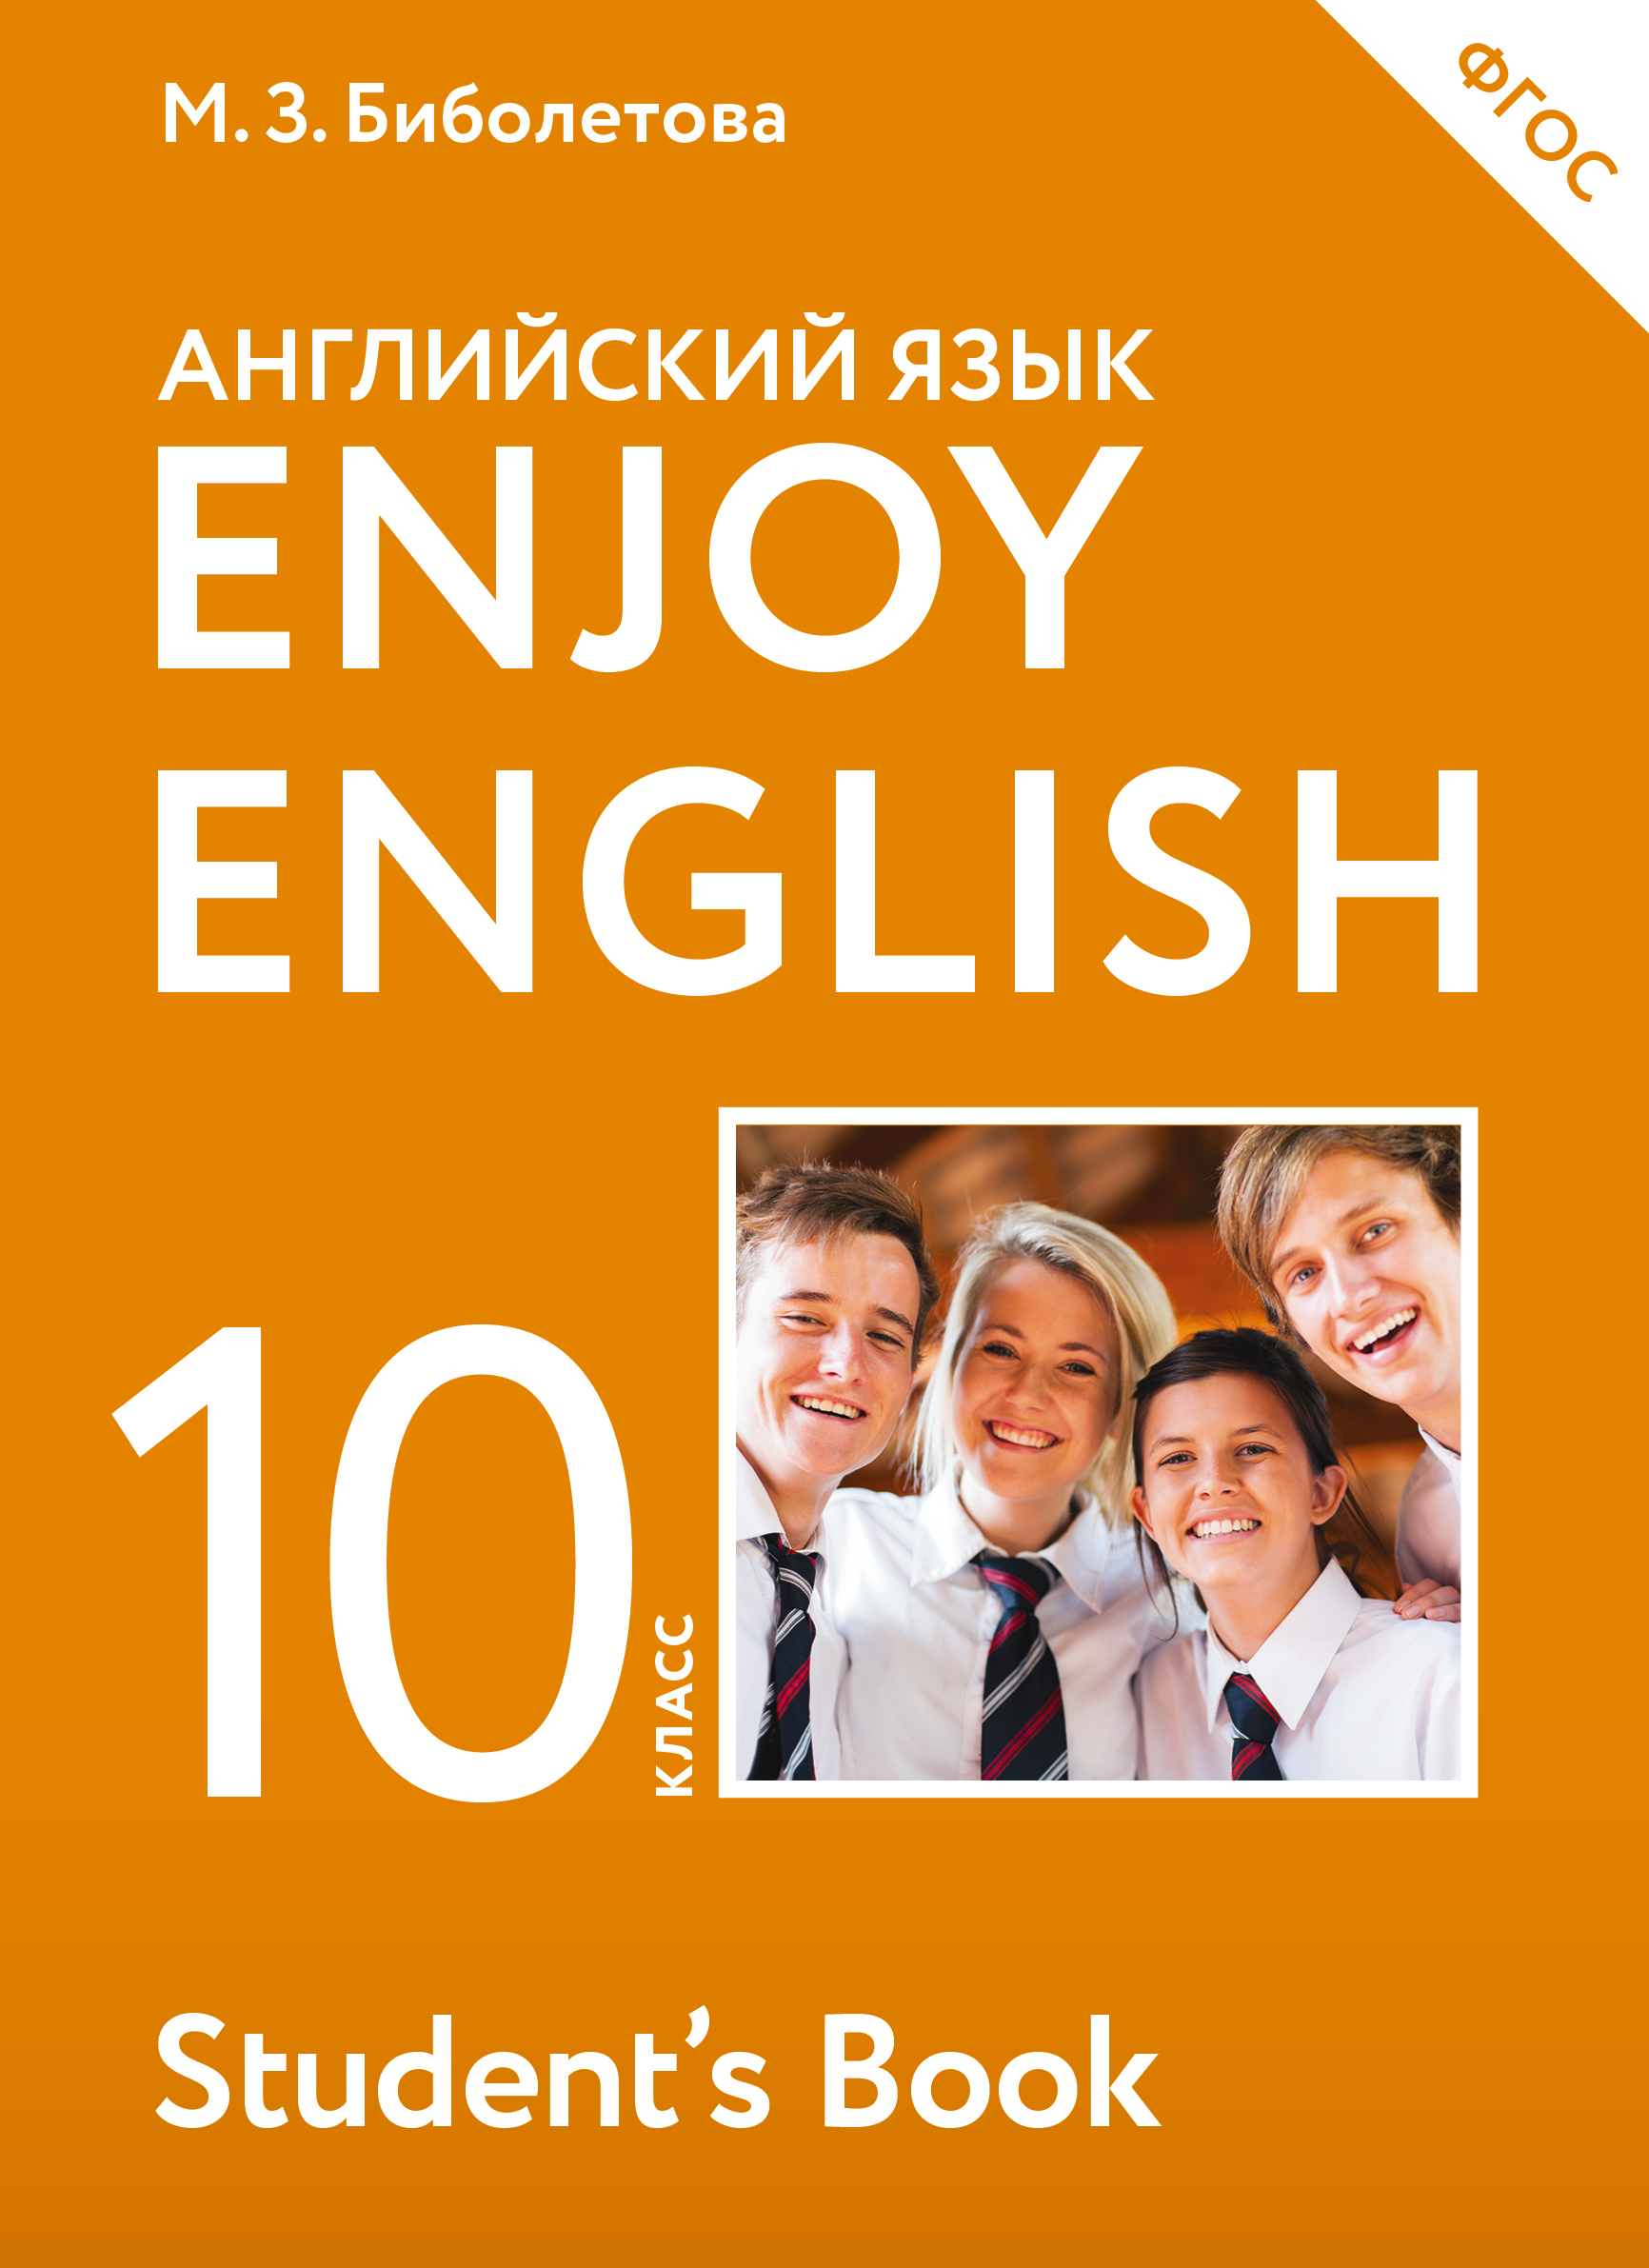 Английский язык. 10 класс. Учебник ( Биболетова М.З., Бабушис Е.Е., Снежко Н.Д.  )